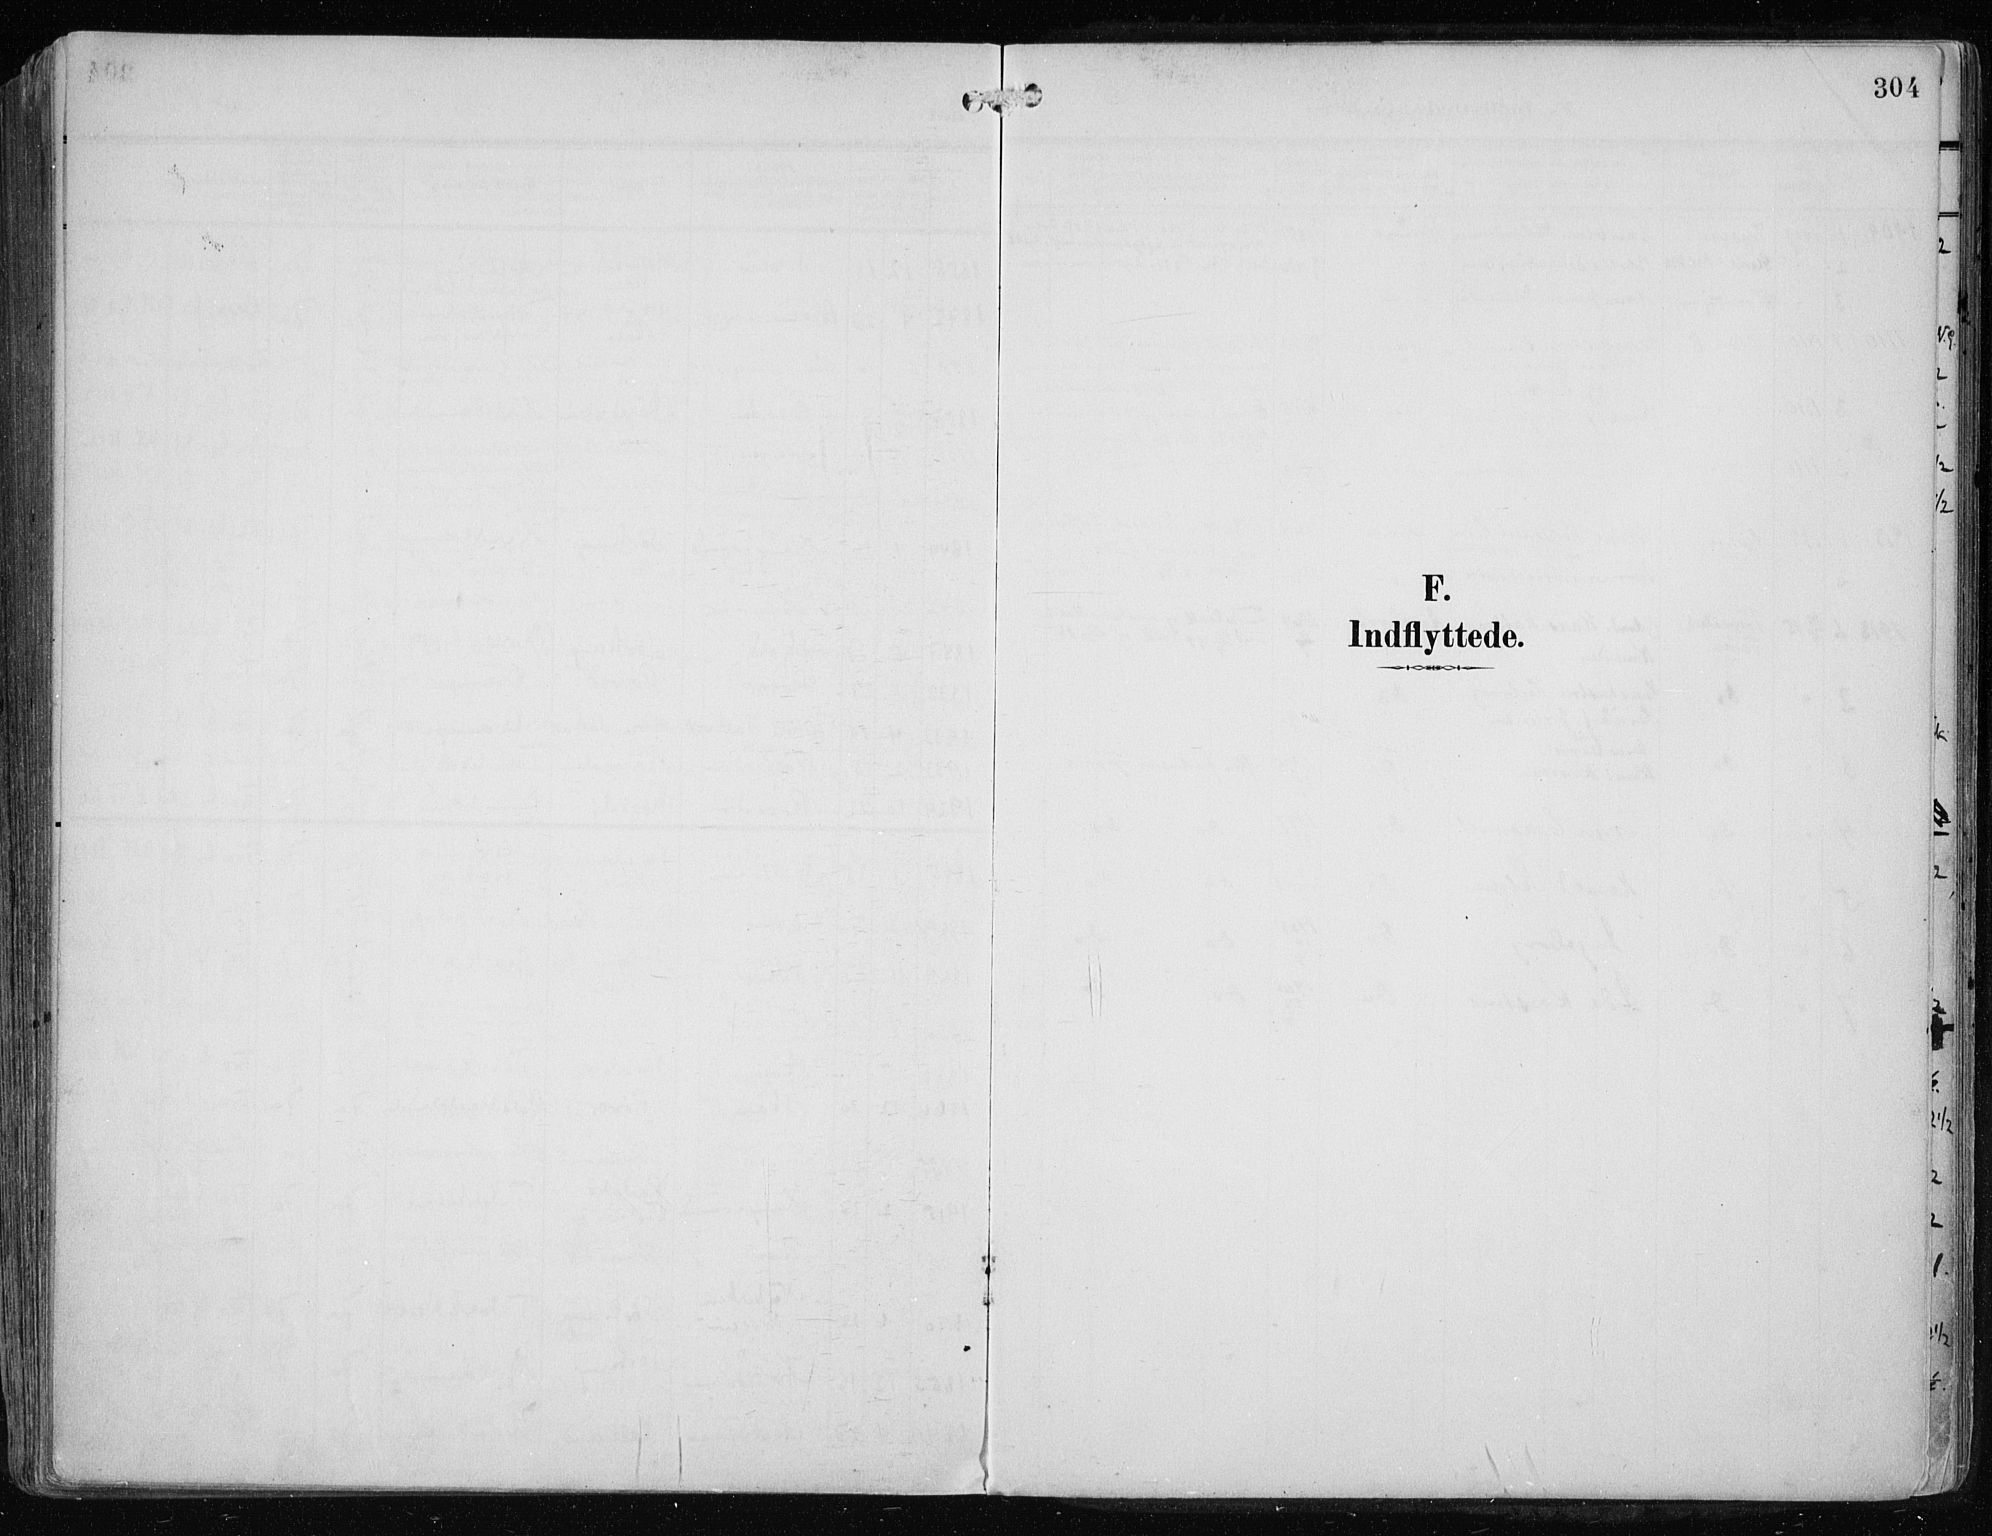 SAST, Haugesund sokneprestkontor, H/Ha/Haa/L0010: Ministerialbok nr. A 10, 1909-1935, s. 304